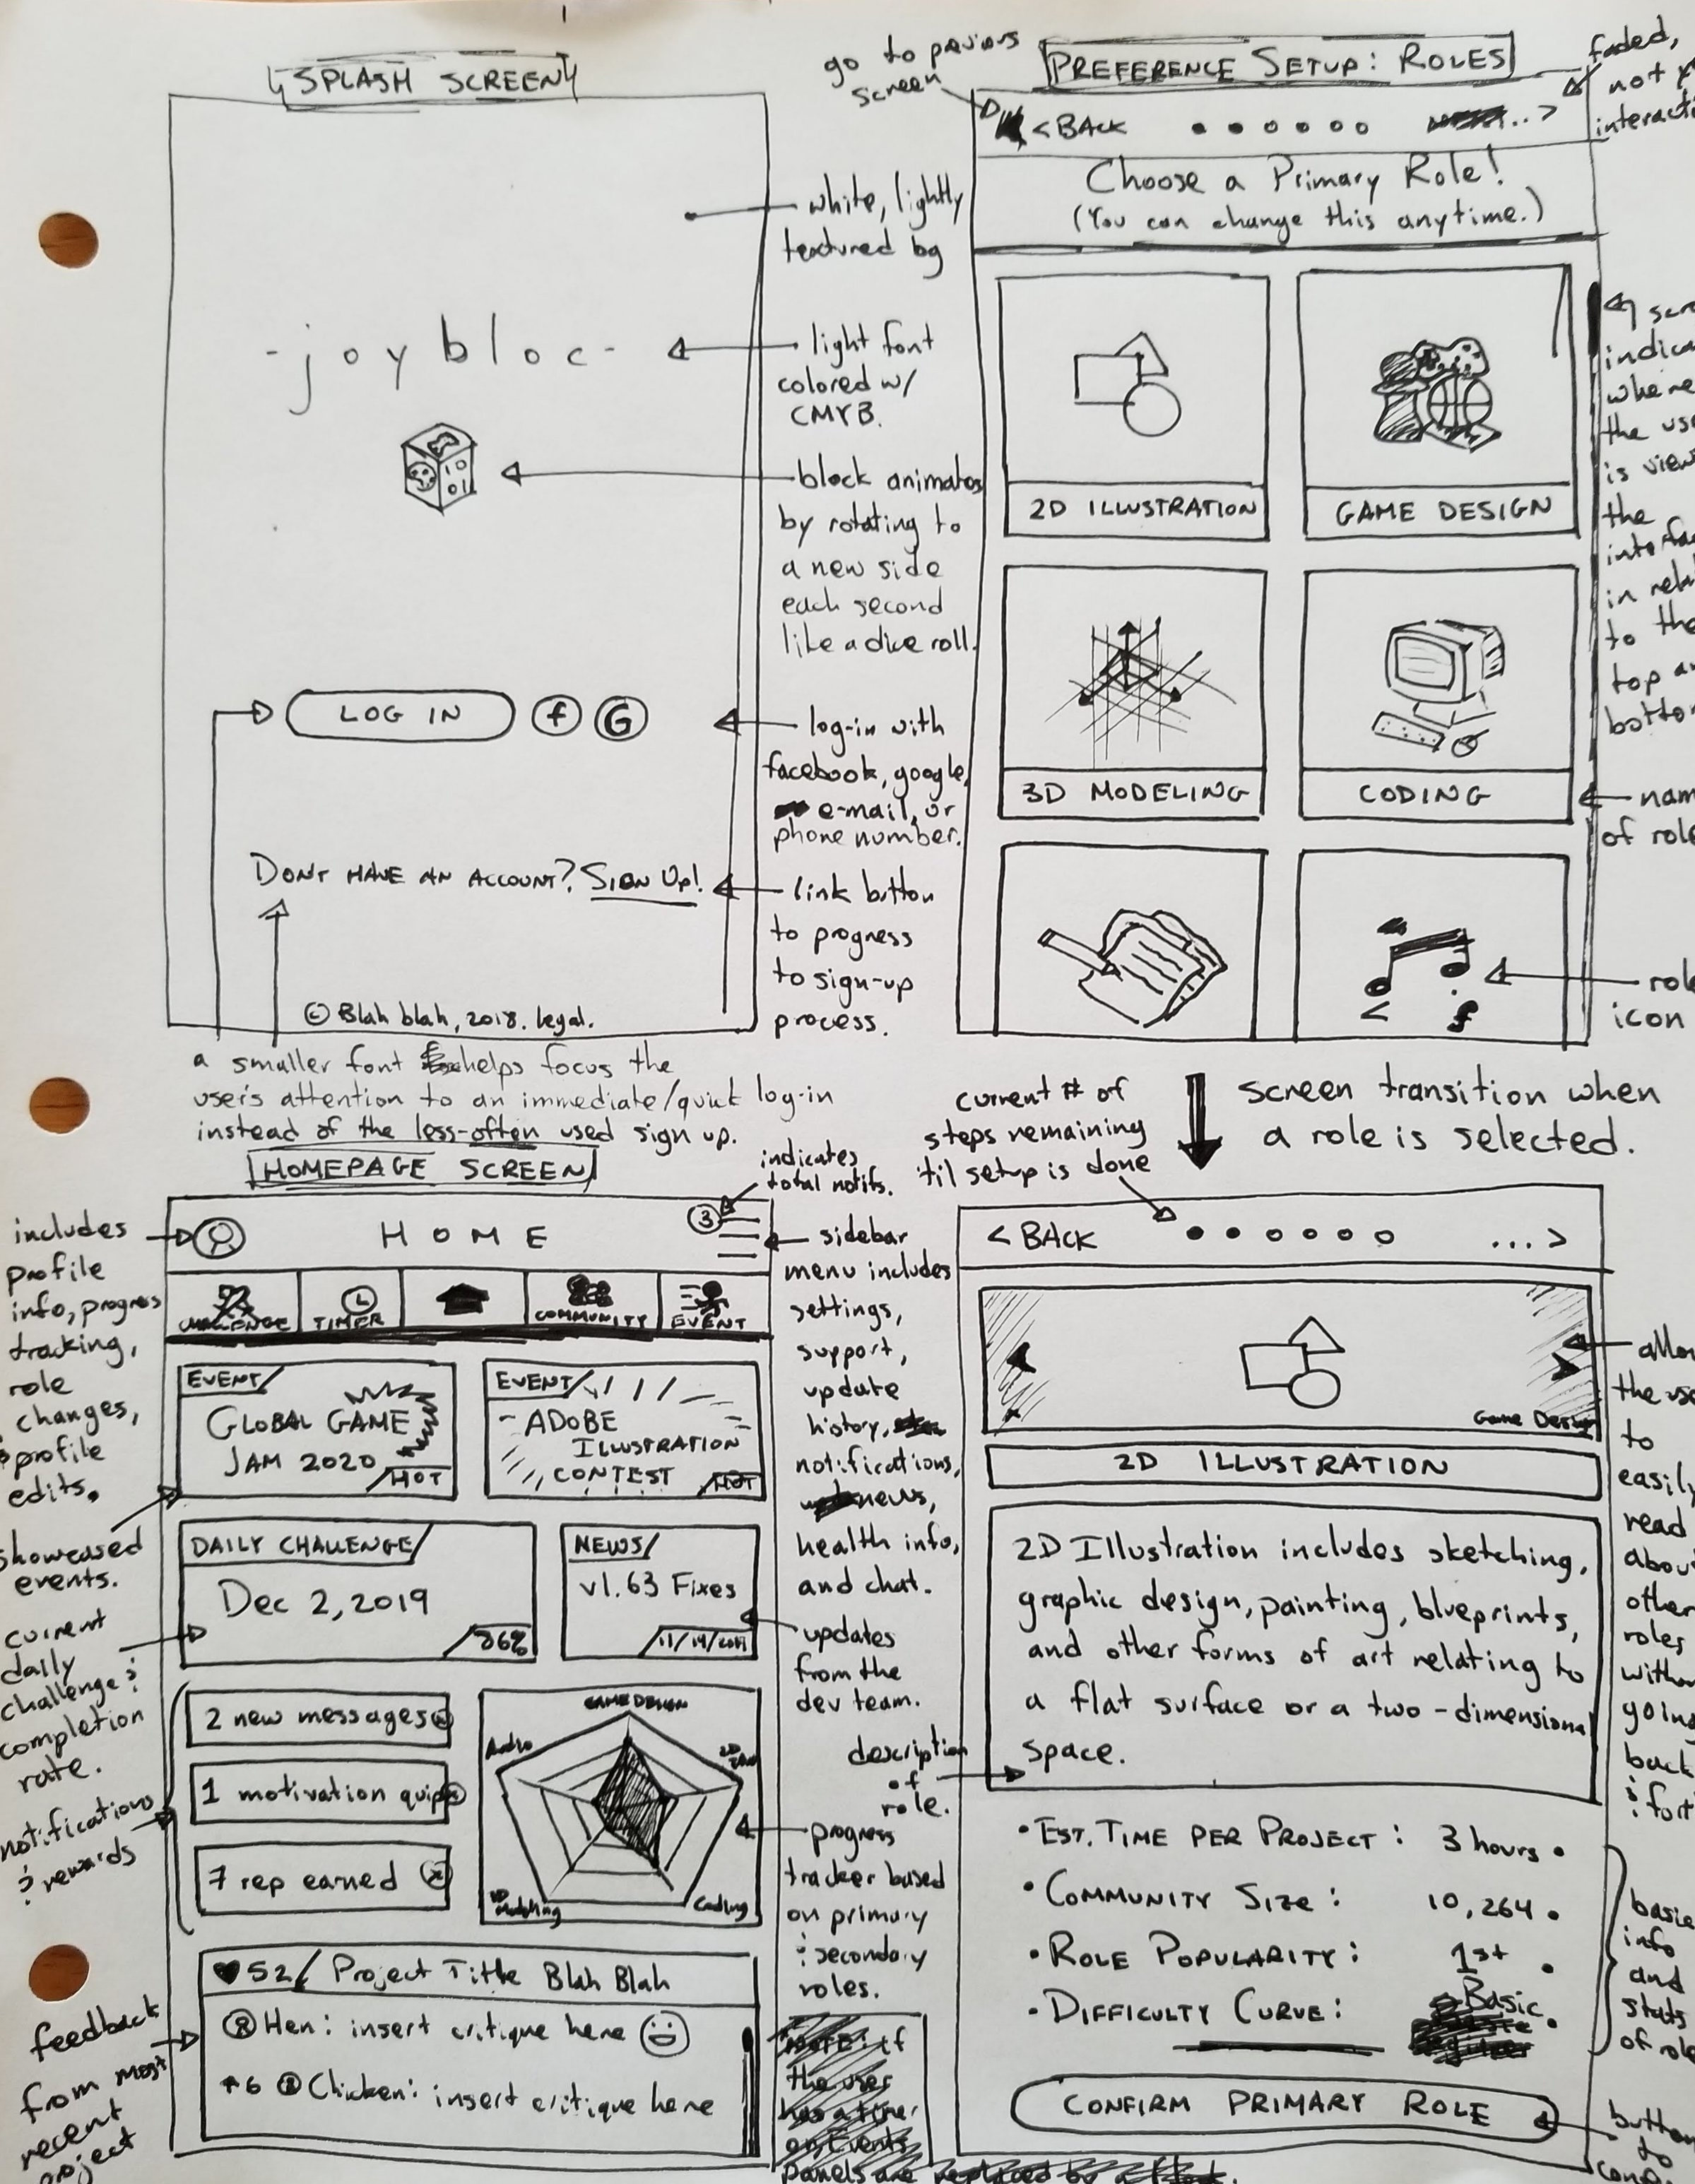 joyblock_sketch_prototype1.jpg